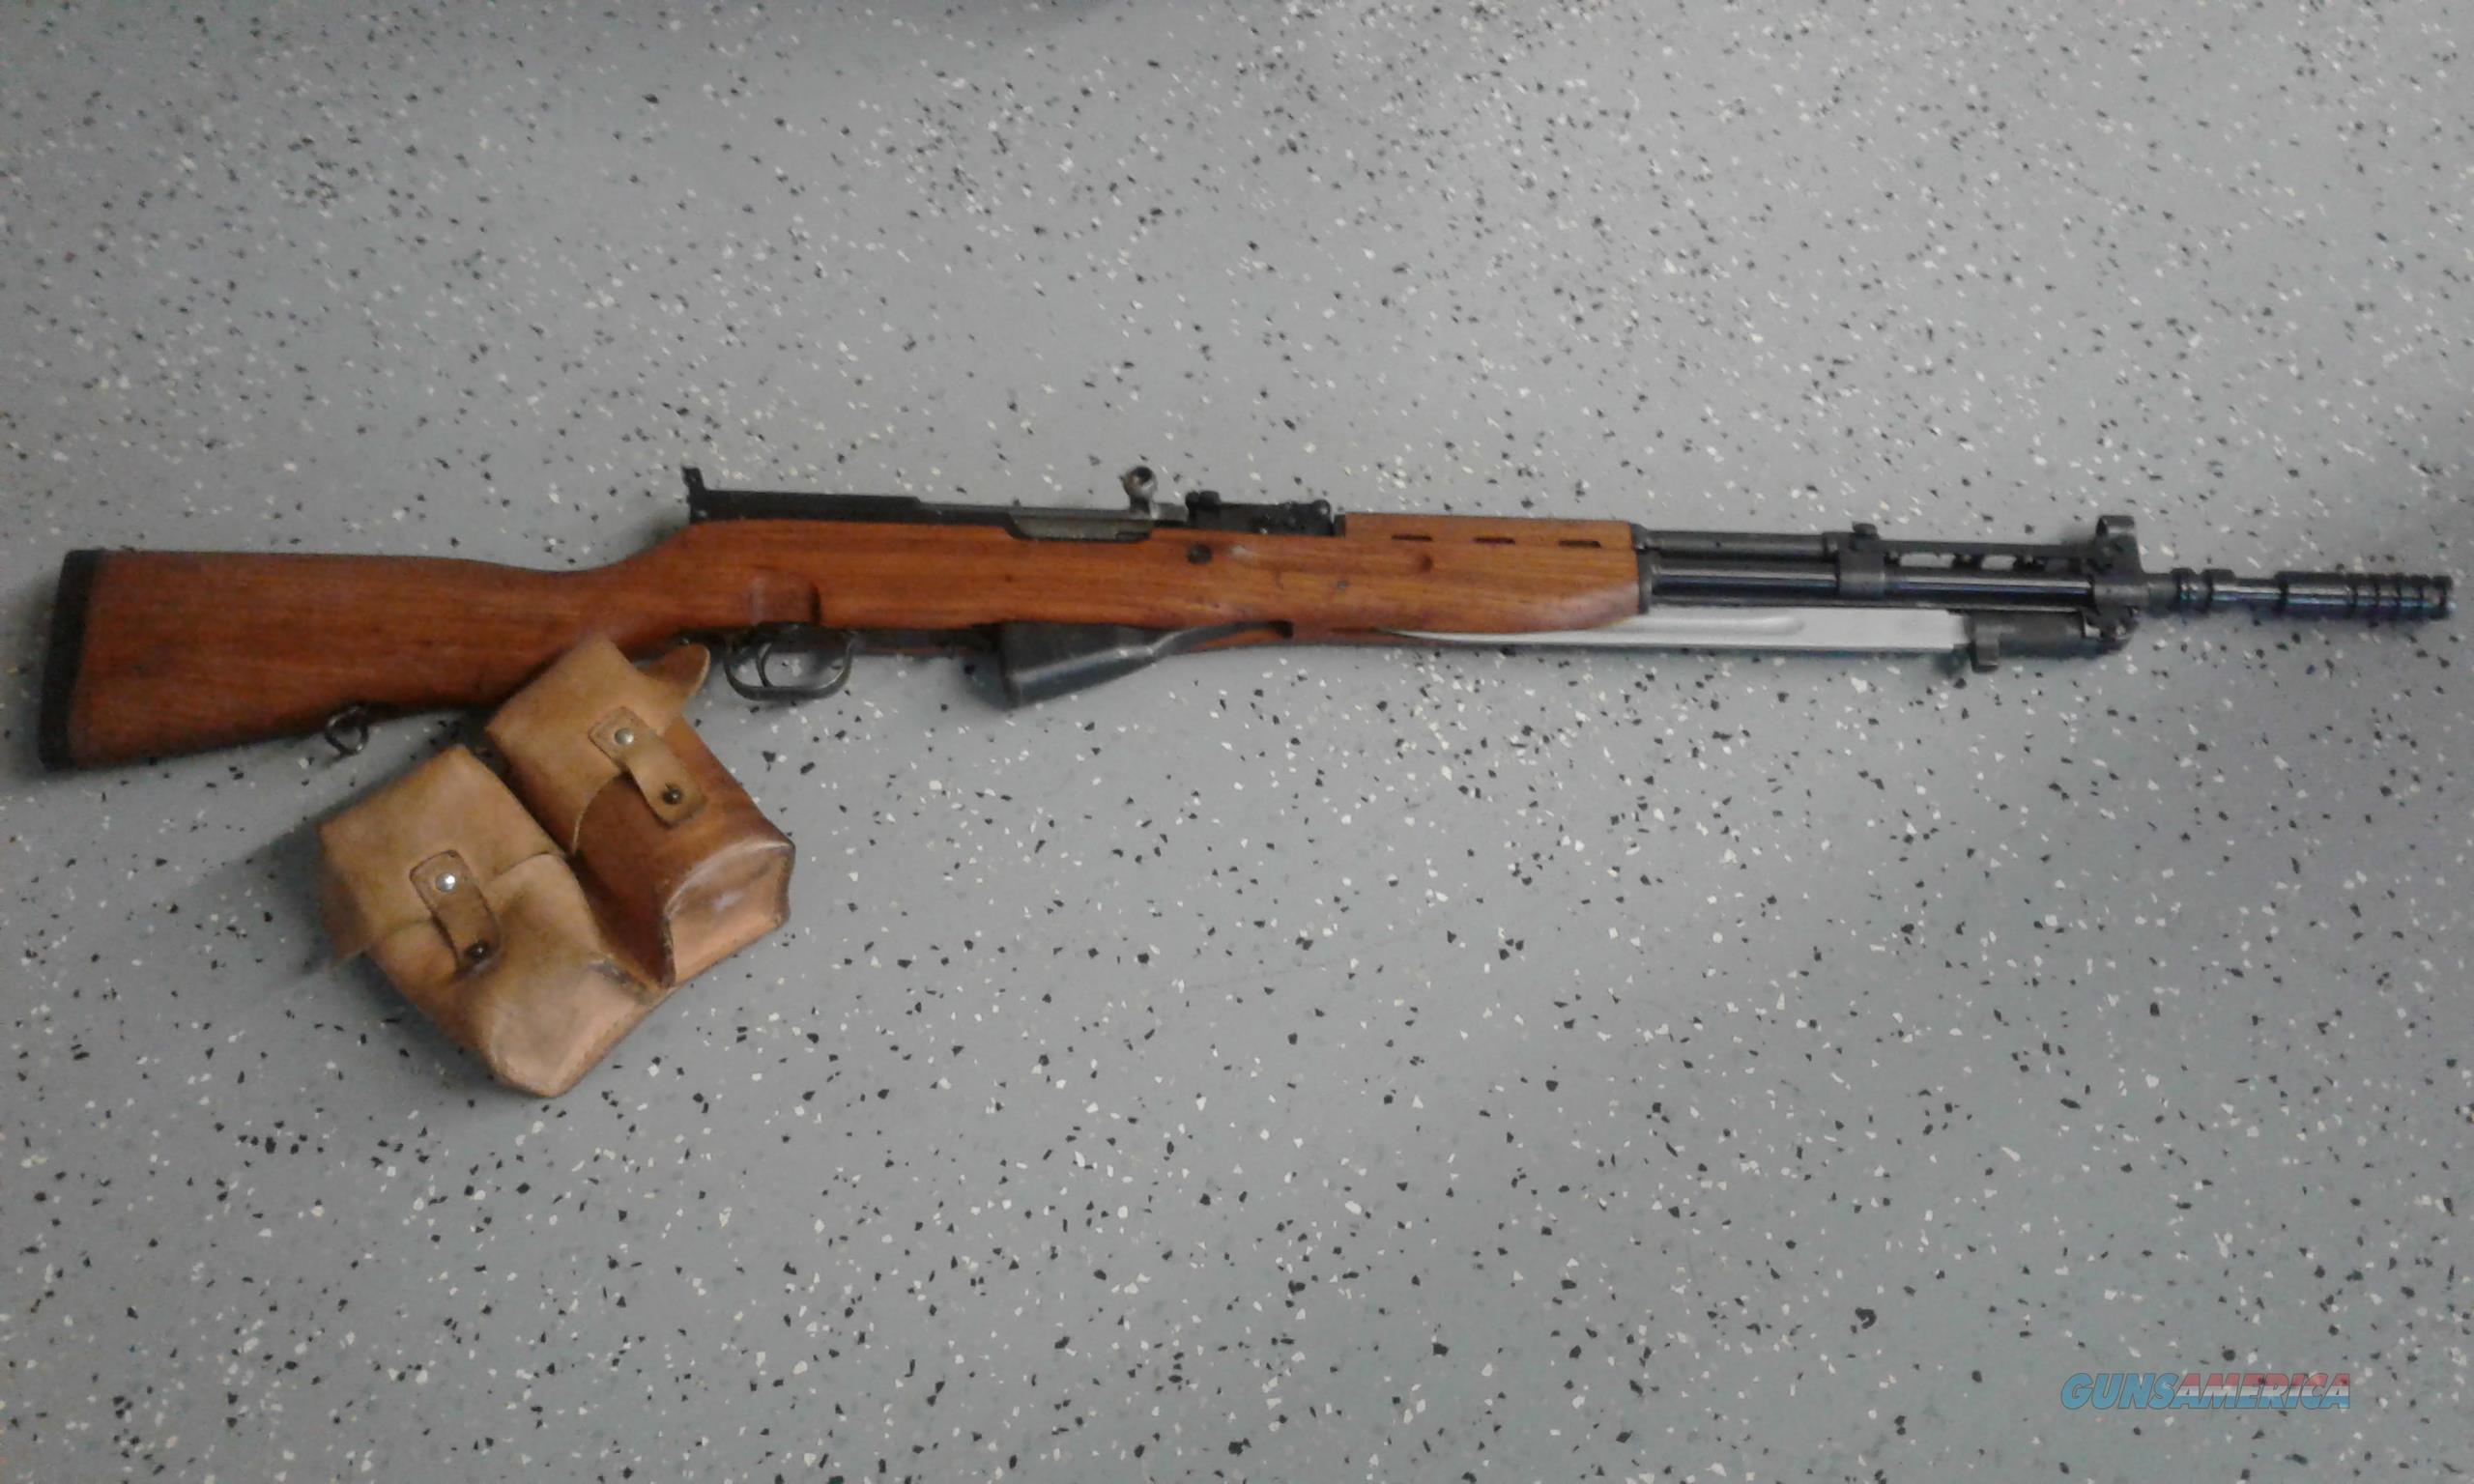 Sks Rifle Yugo 59 66 7 62x39 Still In Cosmolin For Sale